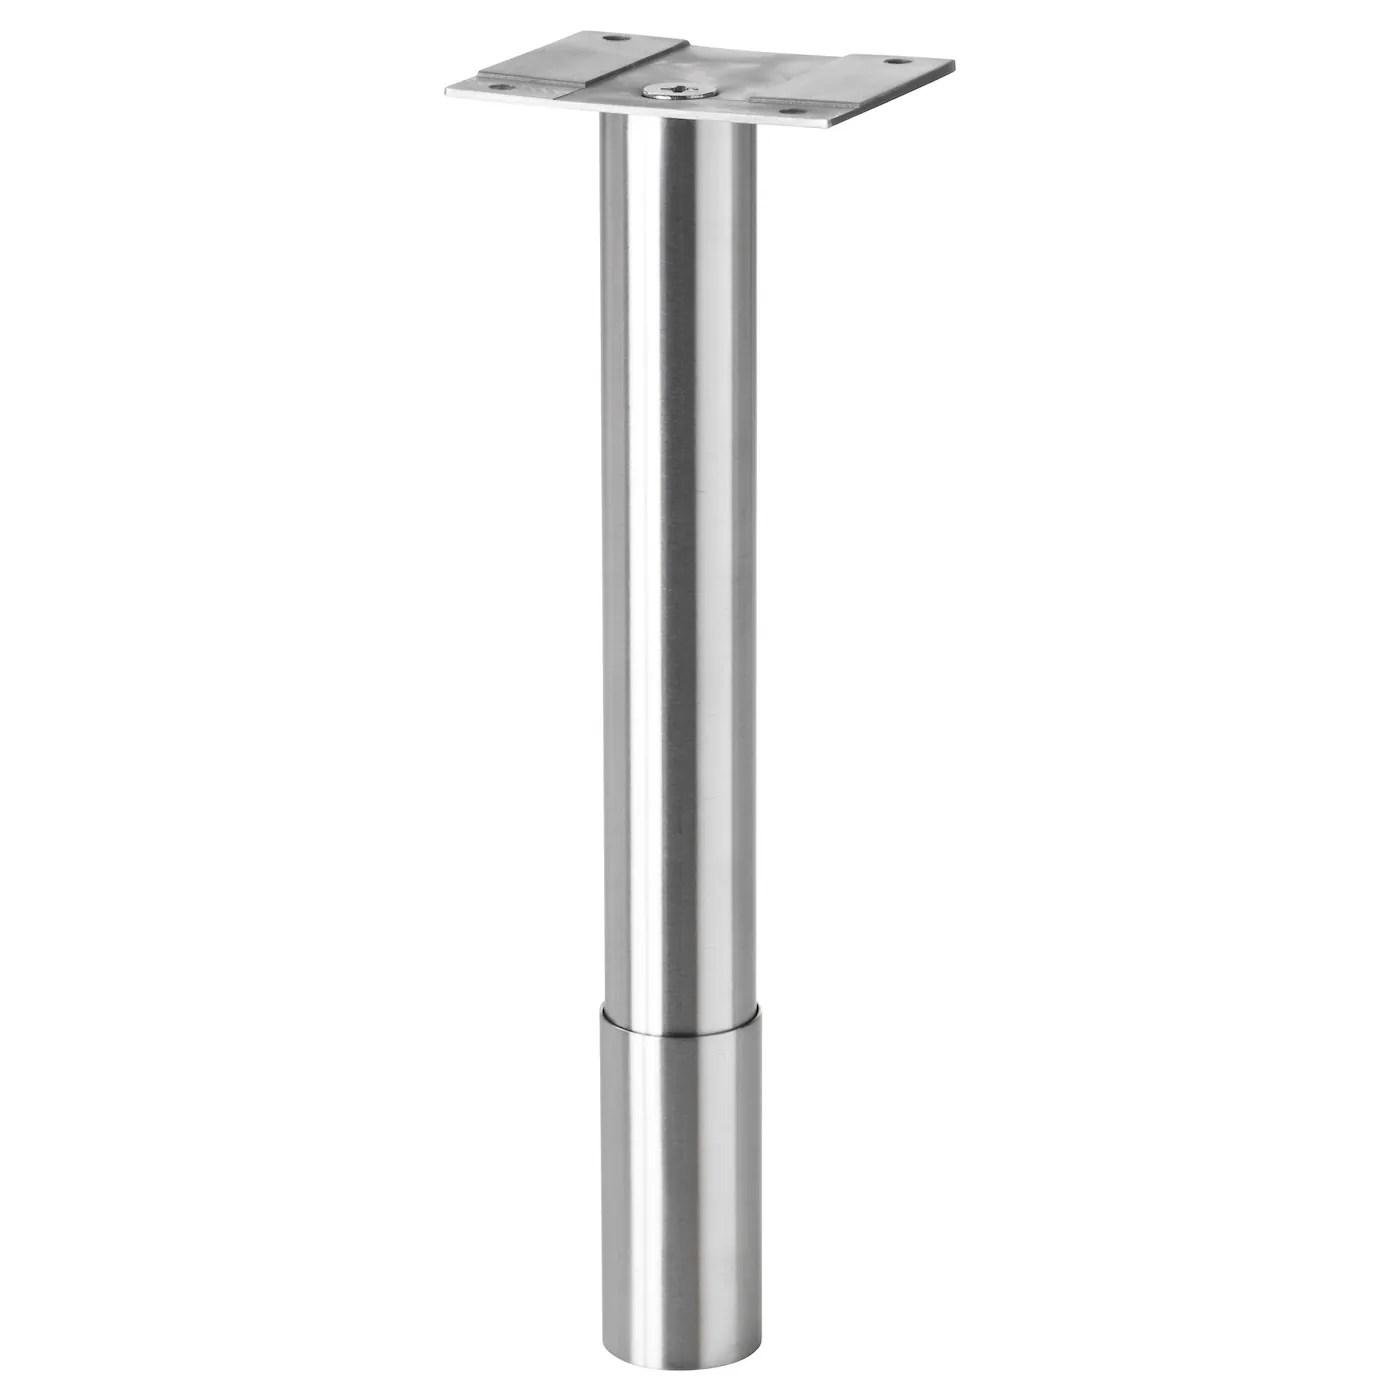 stainless steel chair legs glider slipcovers godmorgon leg round 22 25 cm ikea